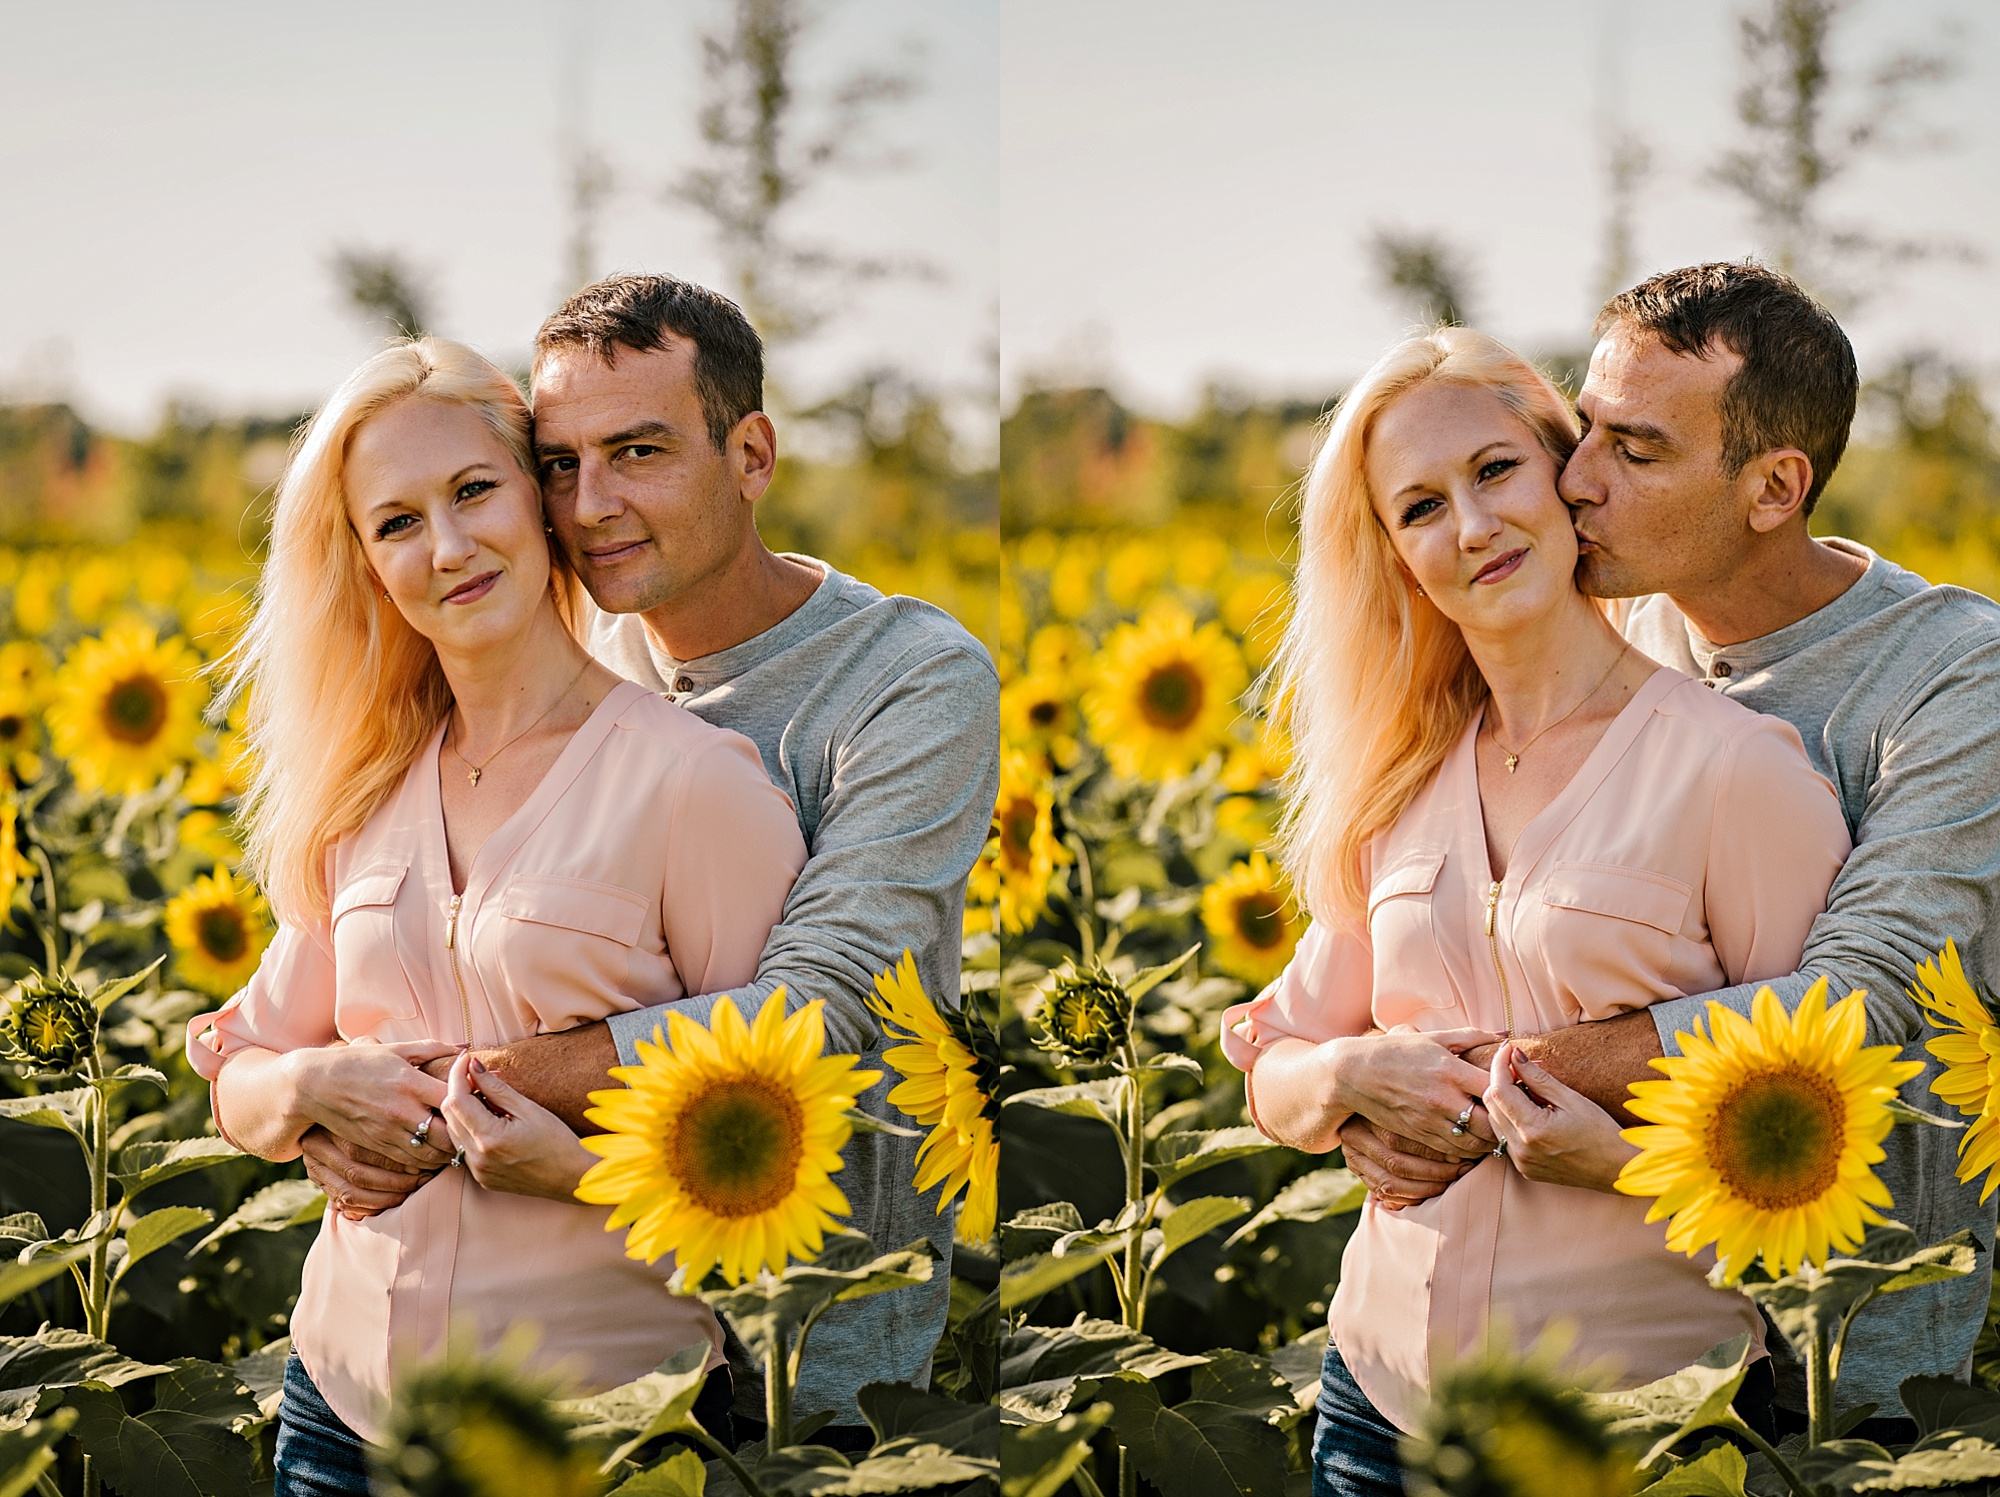 Lori-and-mike-akron-ohio-photographer-lauren-grayson-sunflower-field-session_0003.jpg